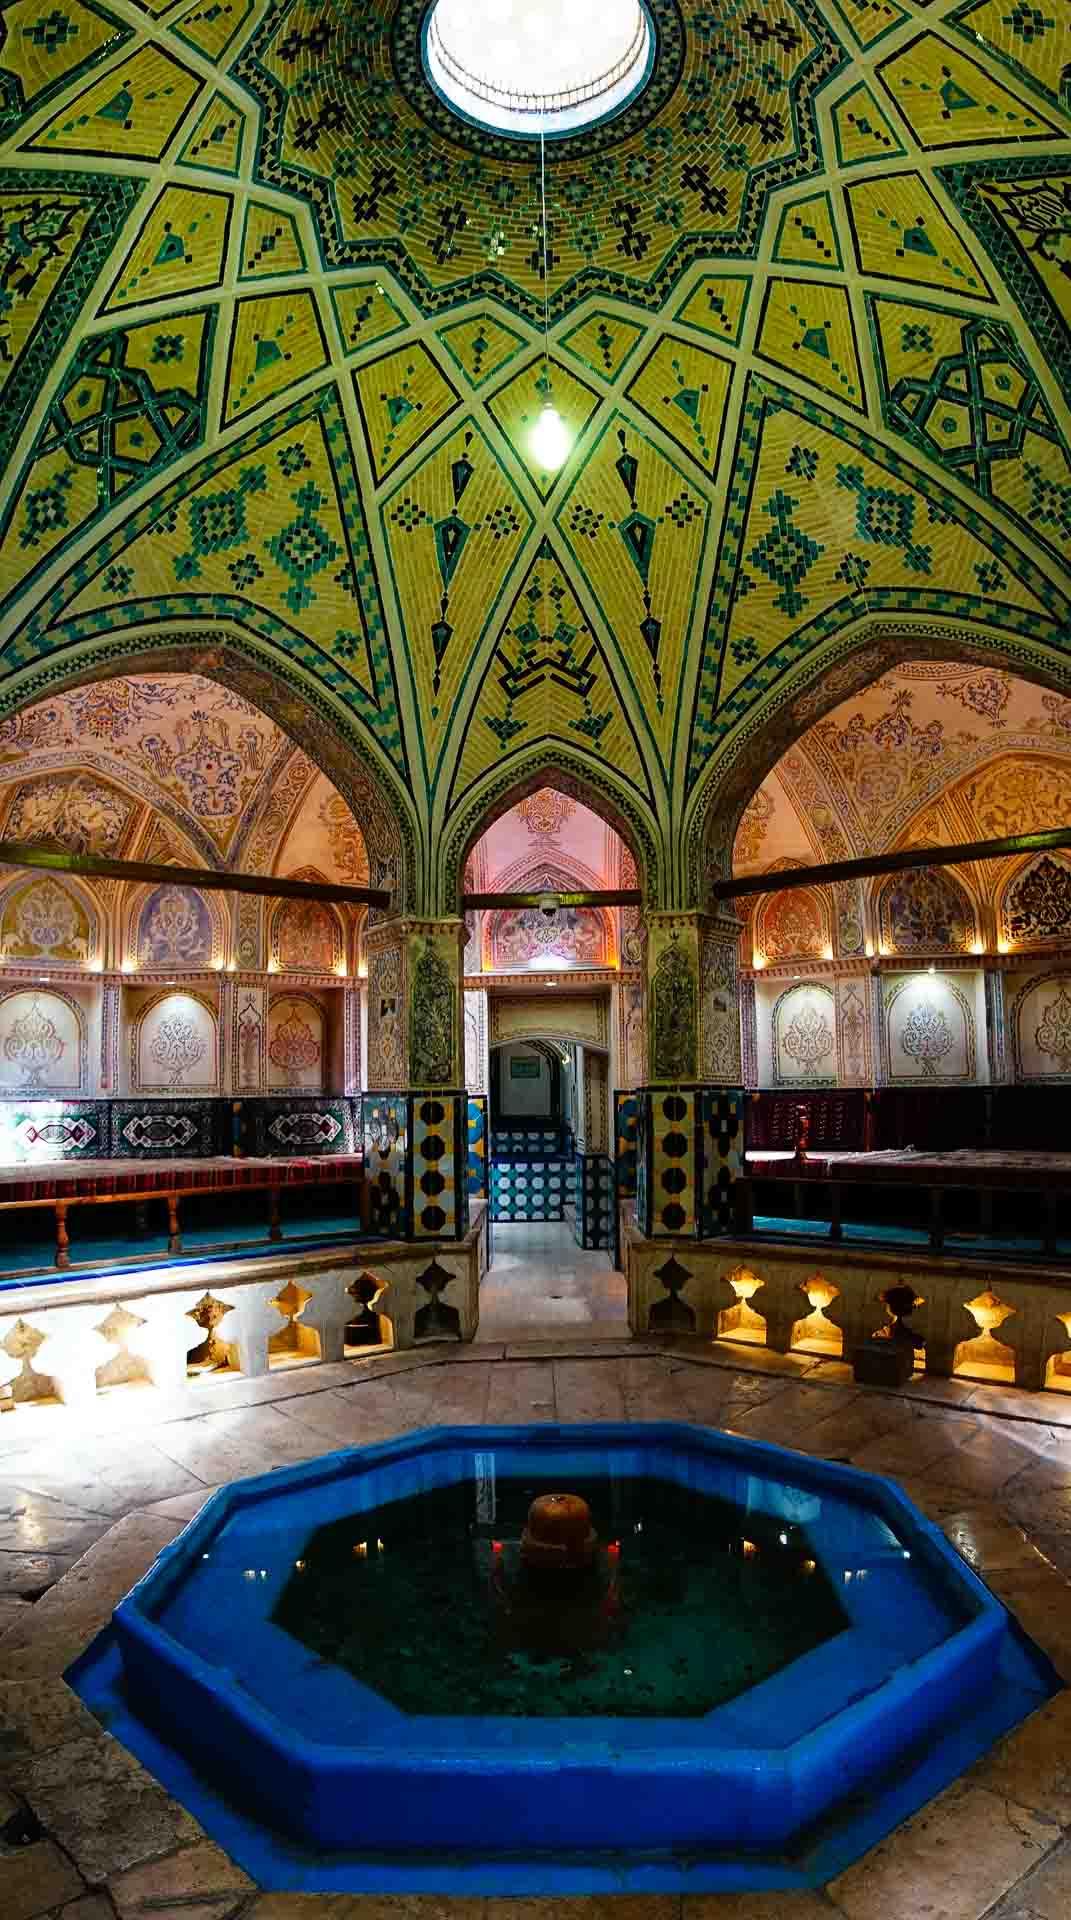 Sultan Amir Ahmad Bathhouse inside 2, kashan, iran, pescart, photo blog, travel blog, blog, photo travel blog, enrico pescantini, pescantini